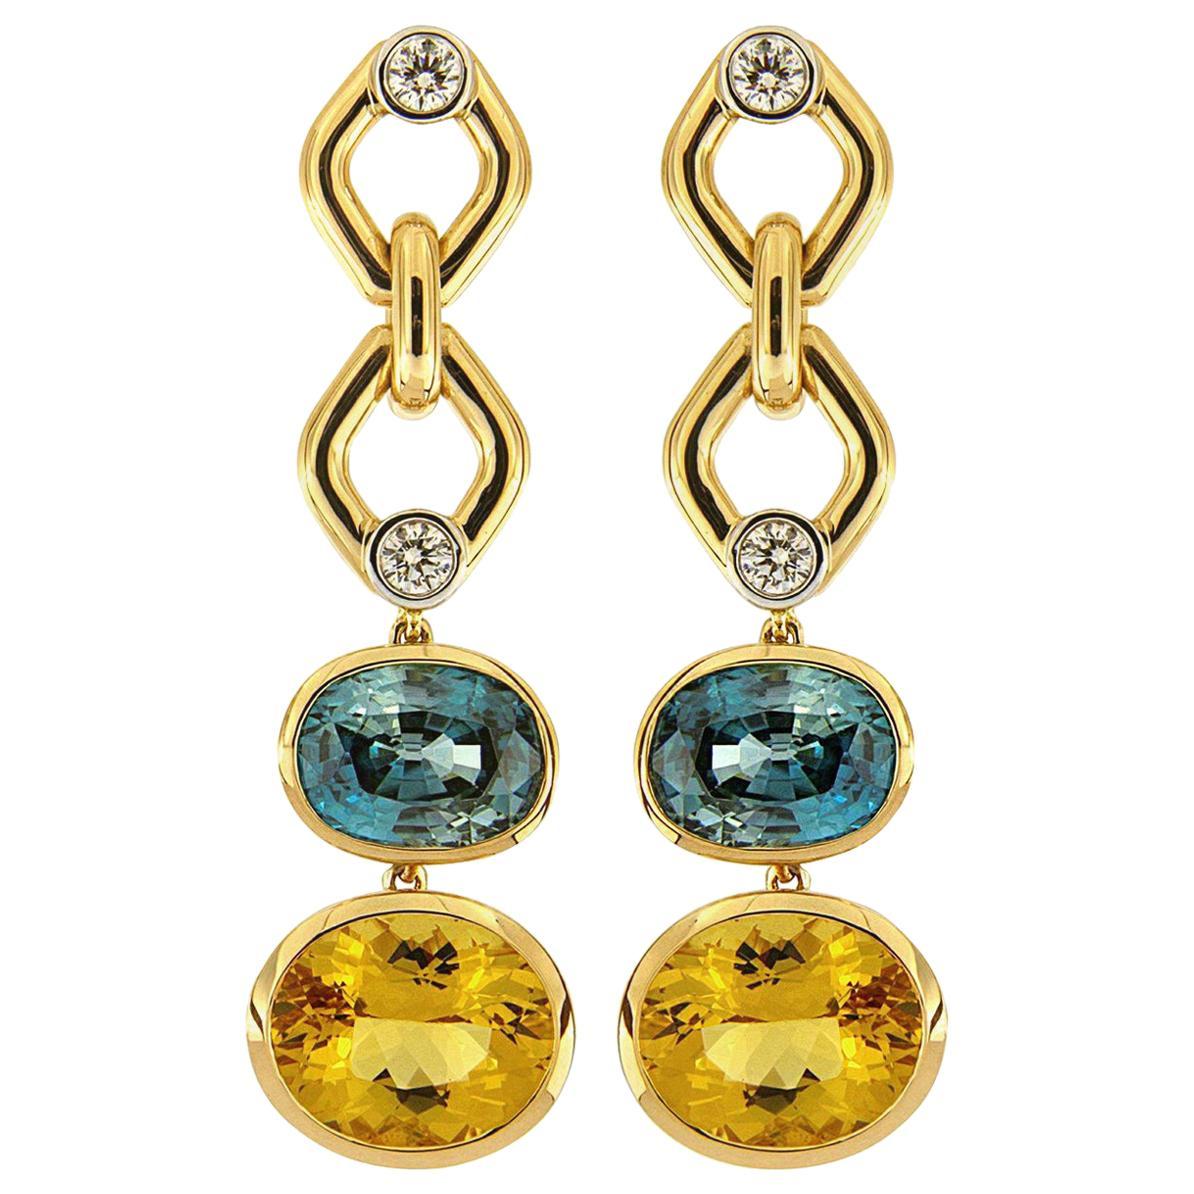 Valentin Magro Zircon and Beryl with Round Brilliant Cut Diamonds Earrings